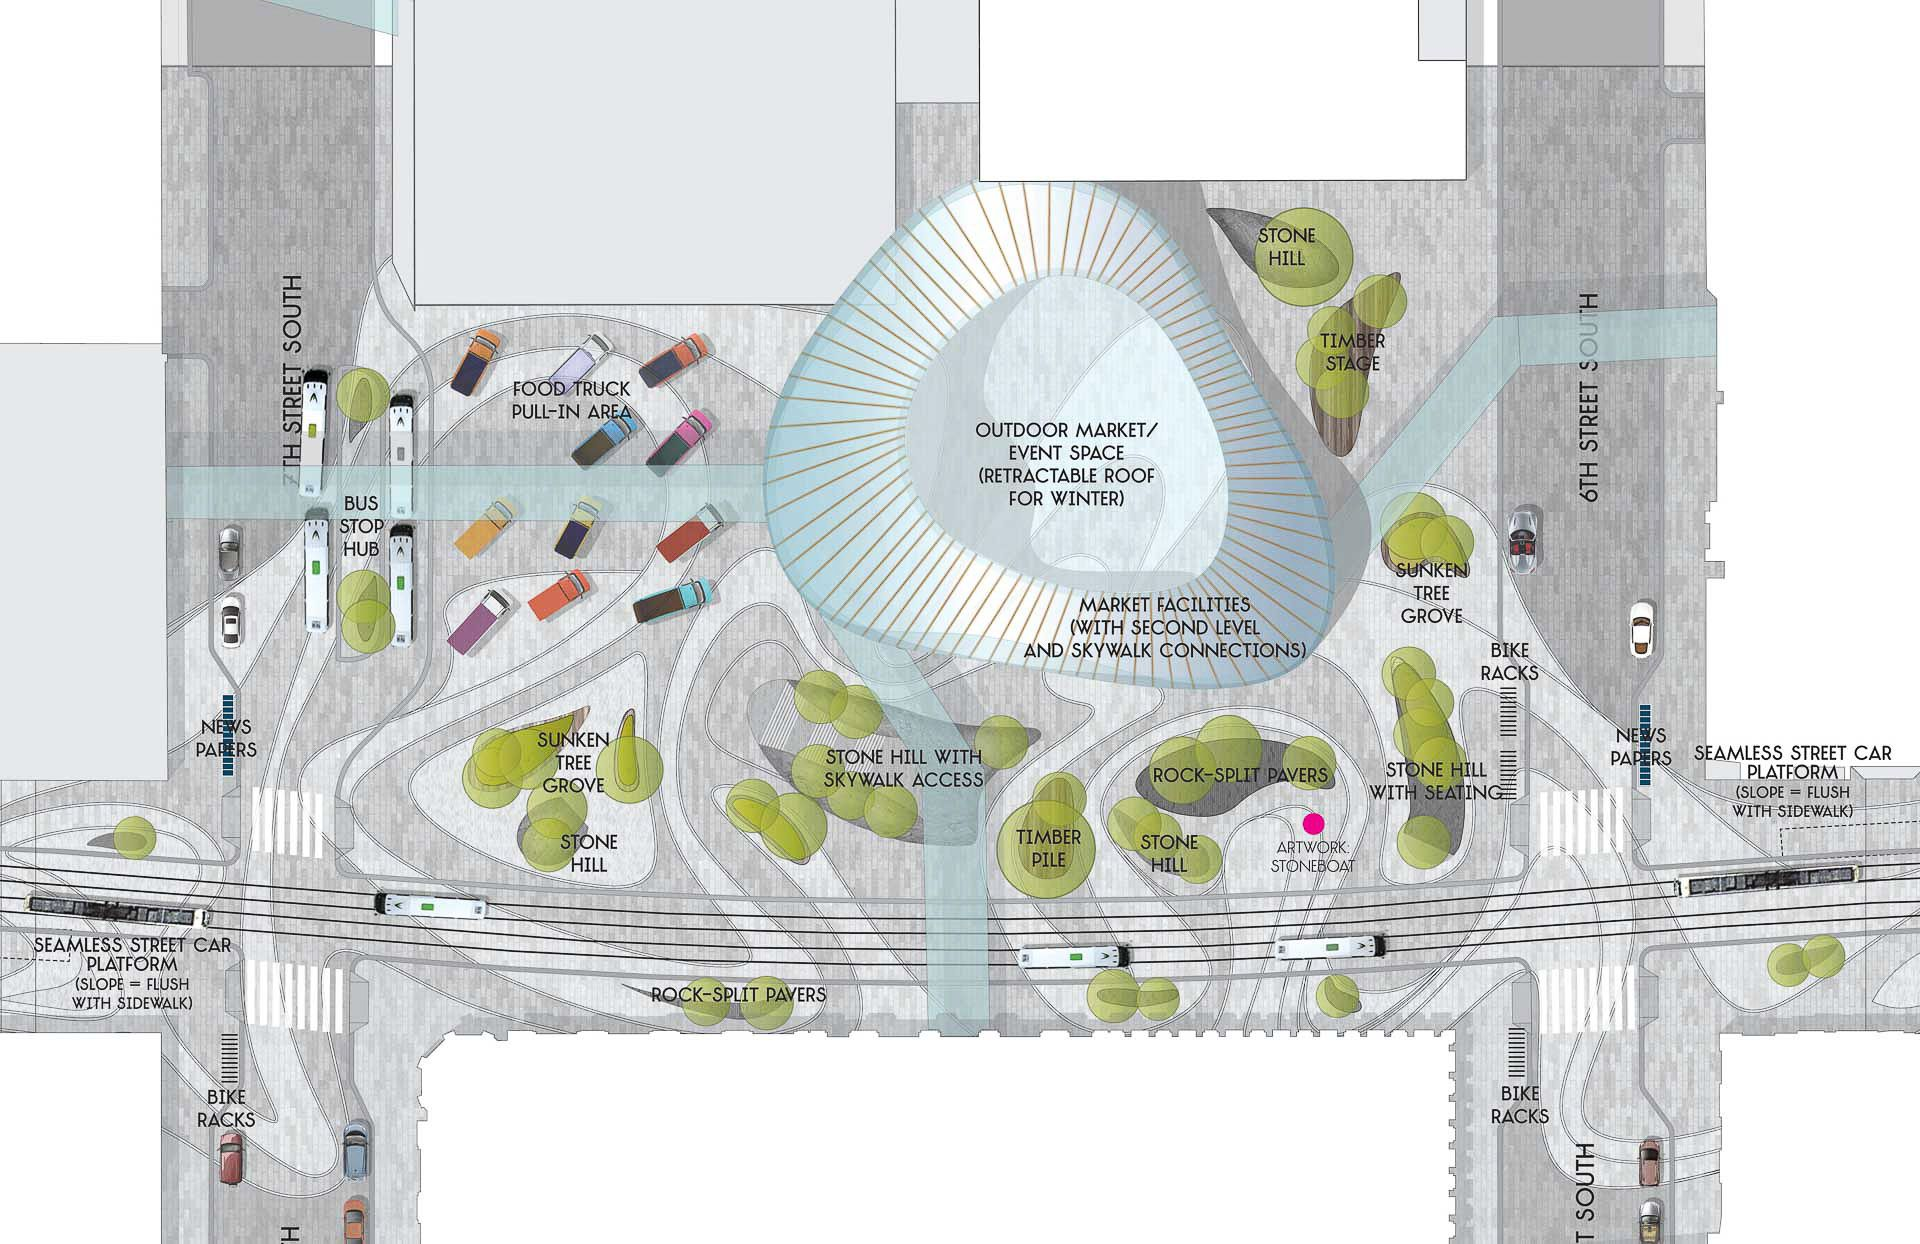 Design Landscape Architecture Architecture Planning Urban